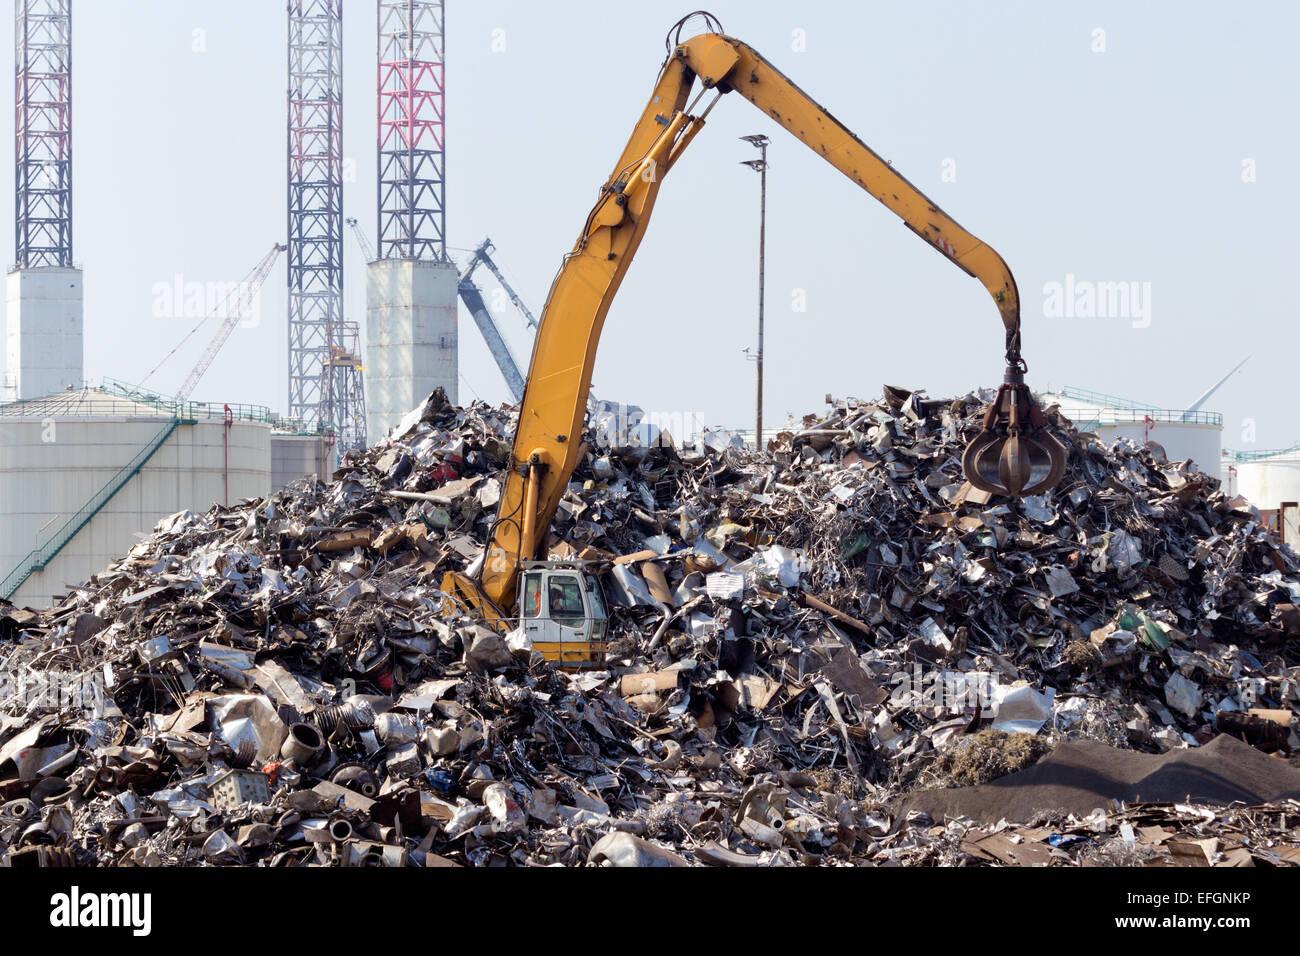 Schrott Metall Dump mit Kran. Stockbild